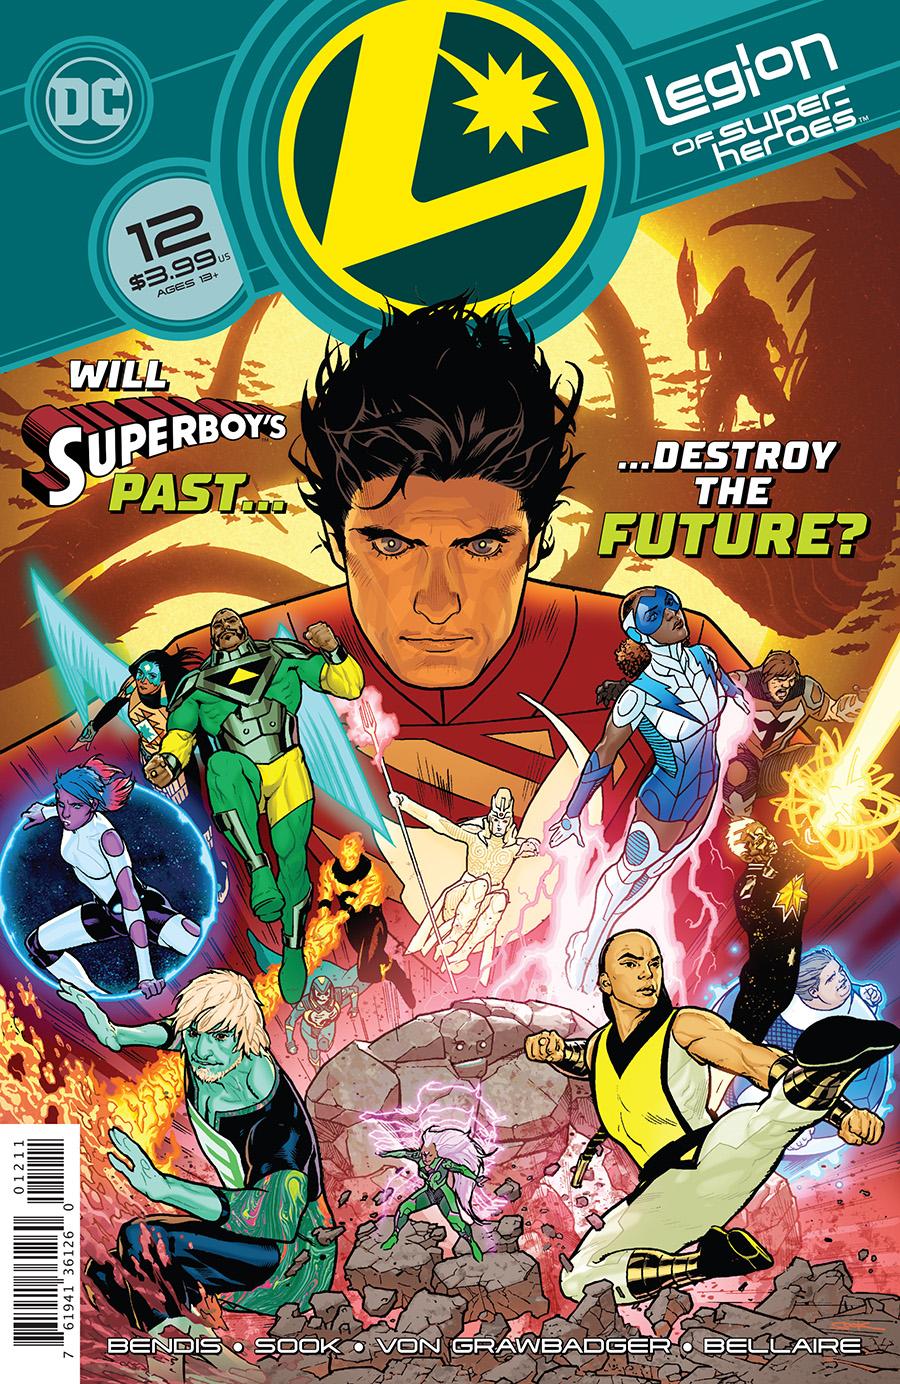 Legion Of Super-Heroes Vol 8 #12 Cover A Regular Ryan Sook Cover